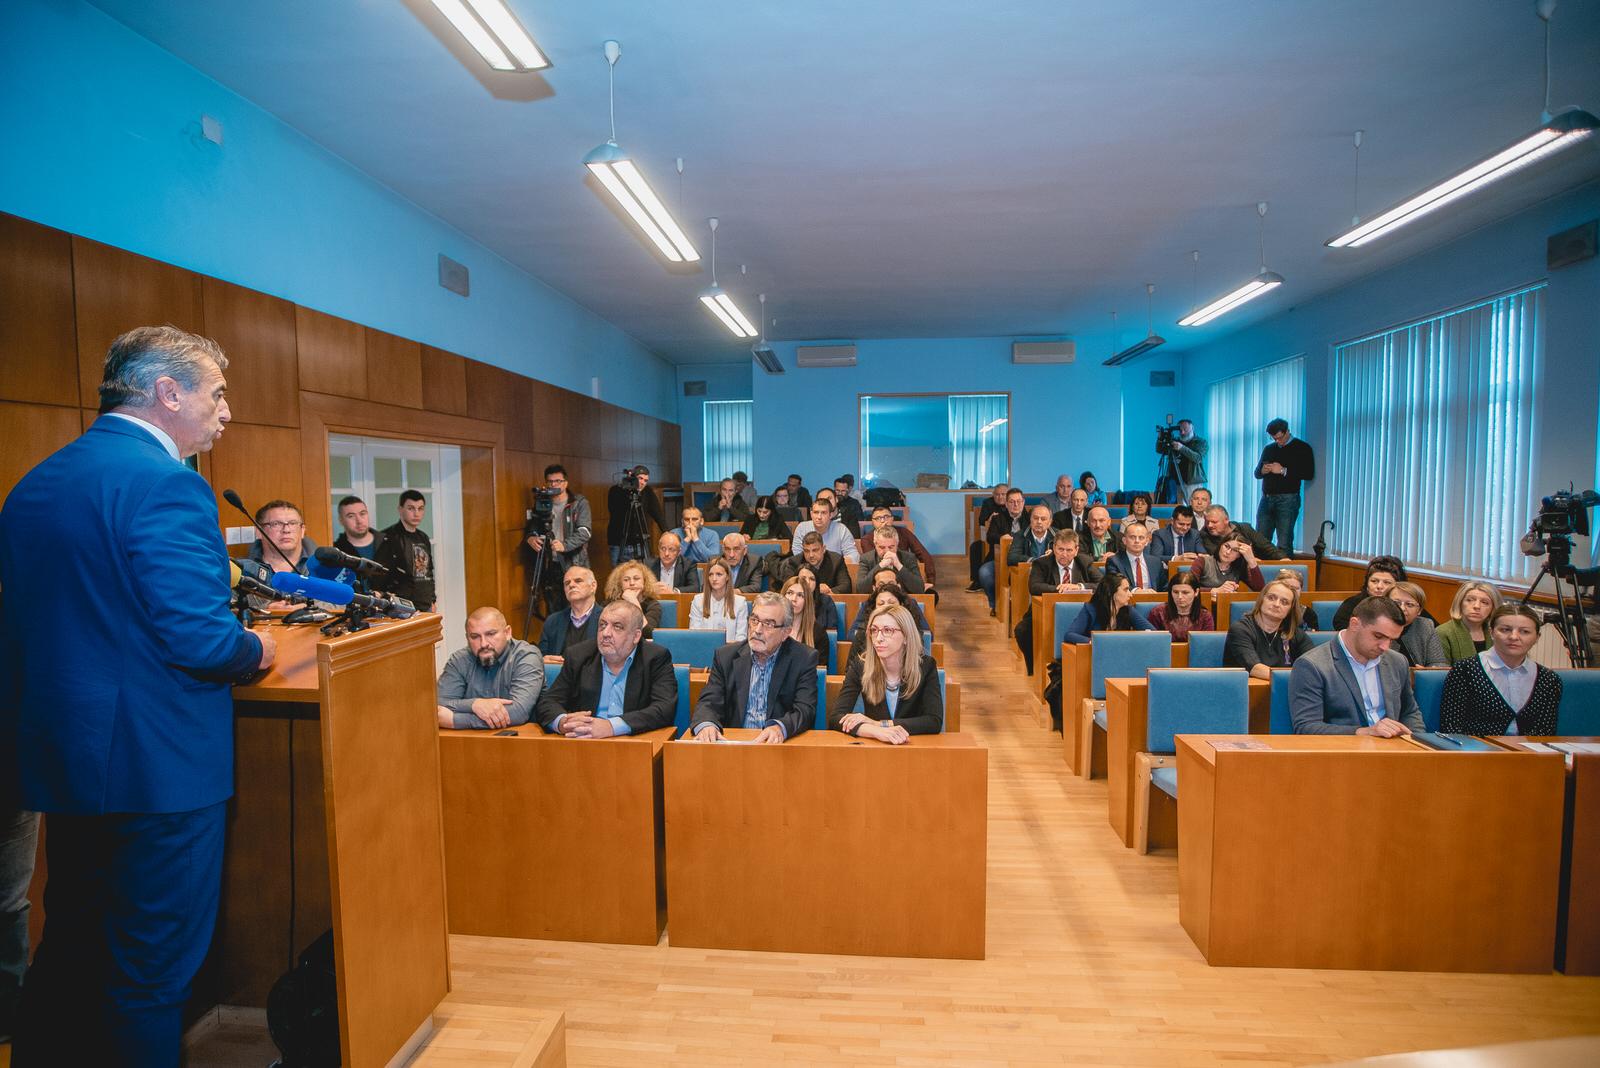 likaclub_gospić_skupština_travanj-2019-27